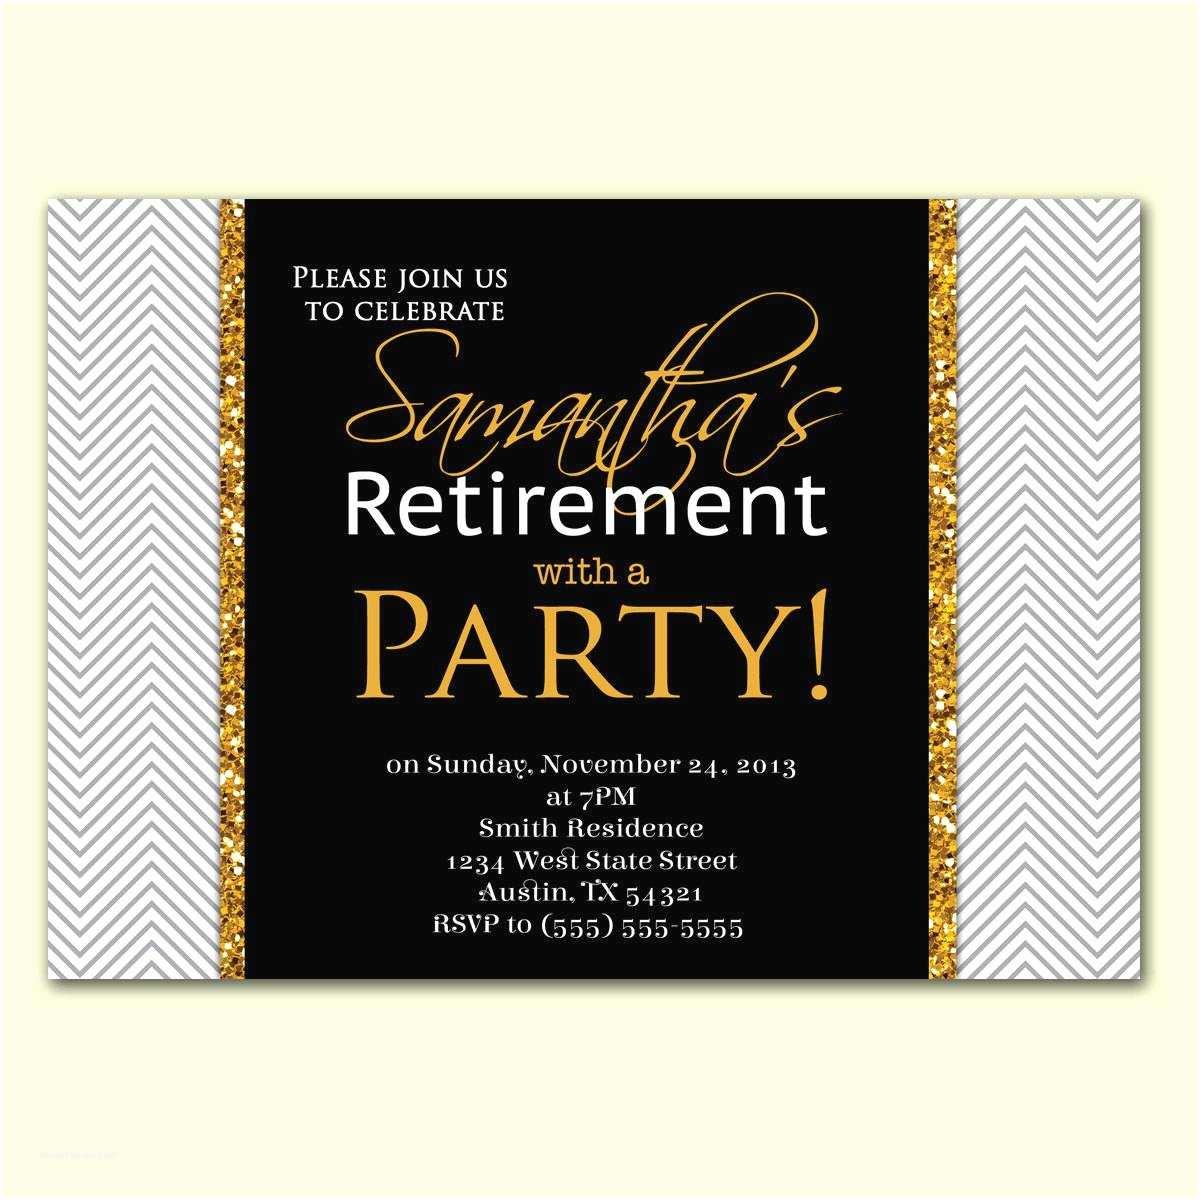 Retirement Party Invitation Wording Retirement Party Invitation Template